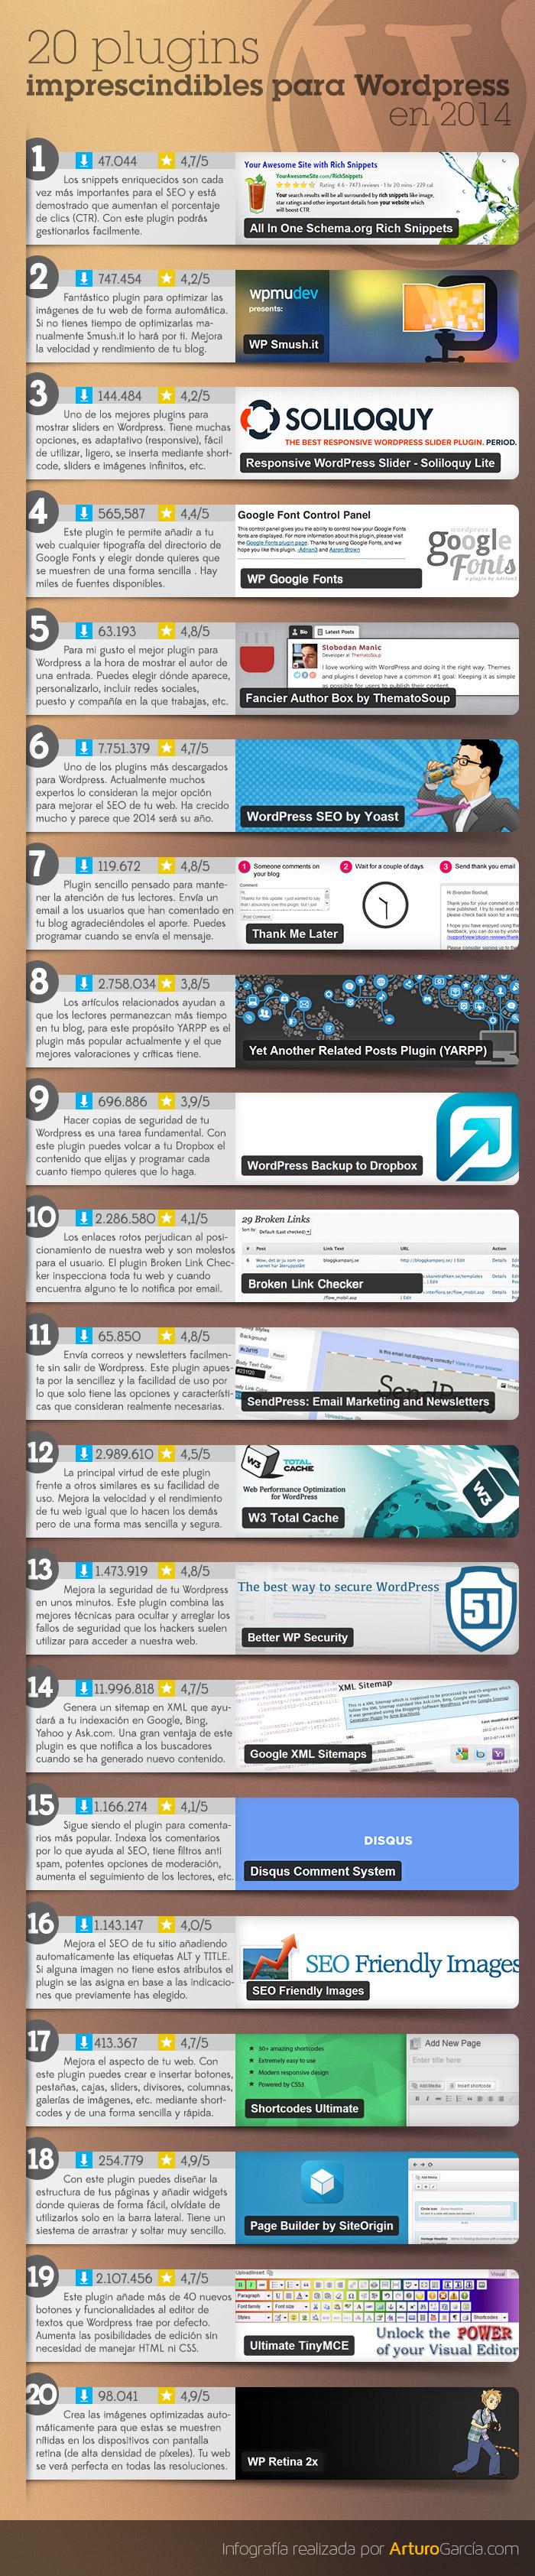 20-plugins-imprescindibles-para-wordpress-2014